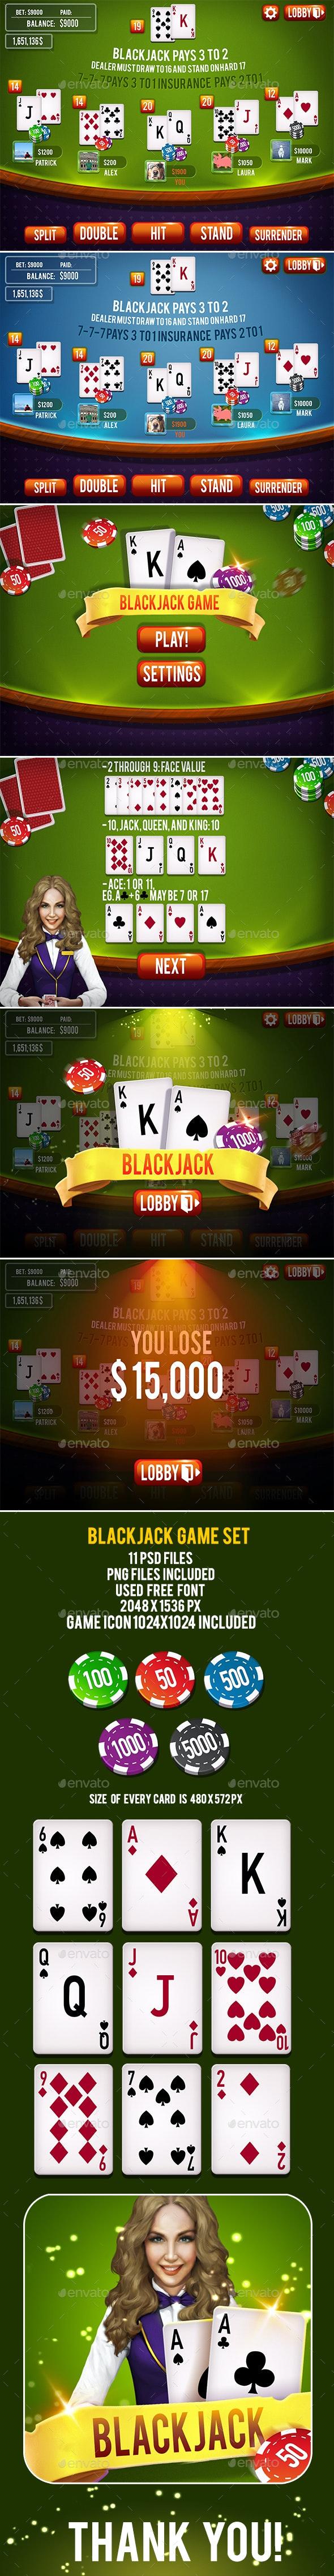 Blackjack Card Game Set By Ververver Graphicriver